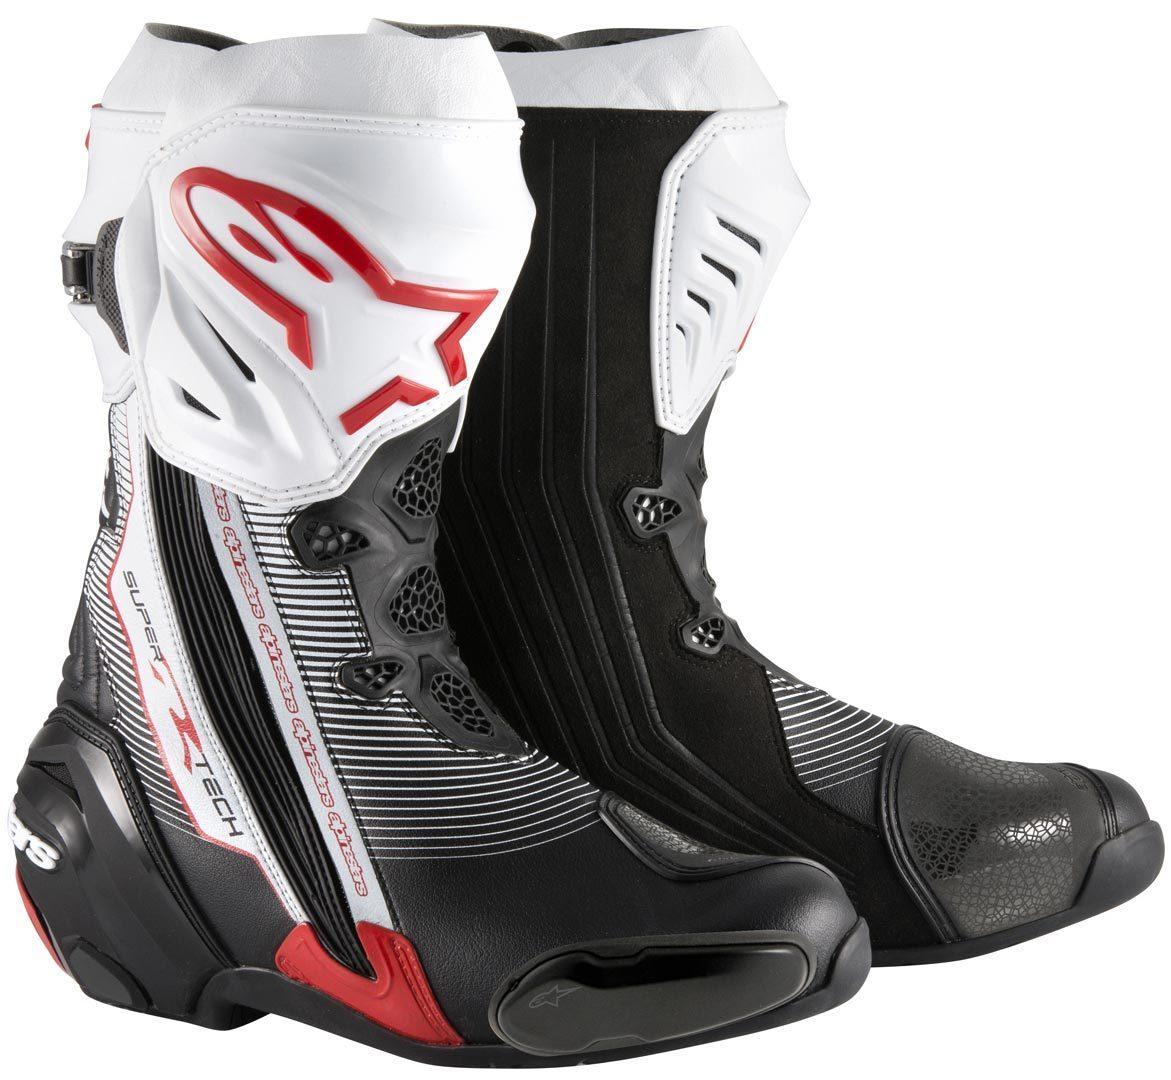 Alpinestars Supertech-R Motorradstiefel, schwarz-weiss-rot, Größe 44, schwarz-weiss-rot, Größe 44